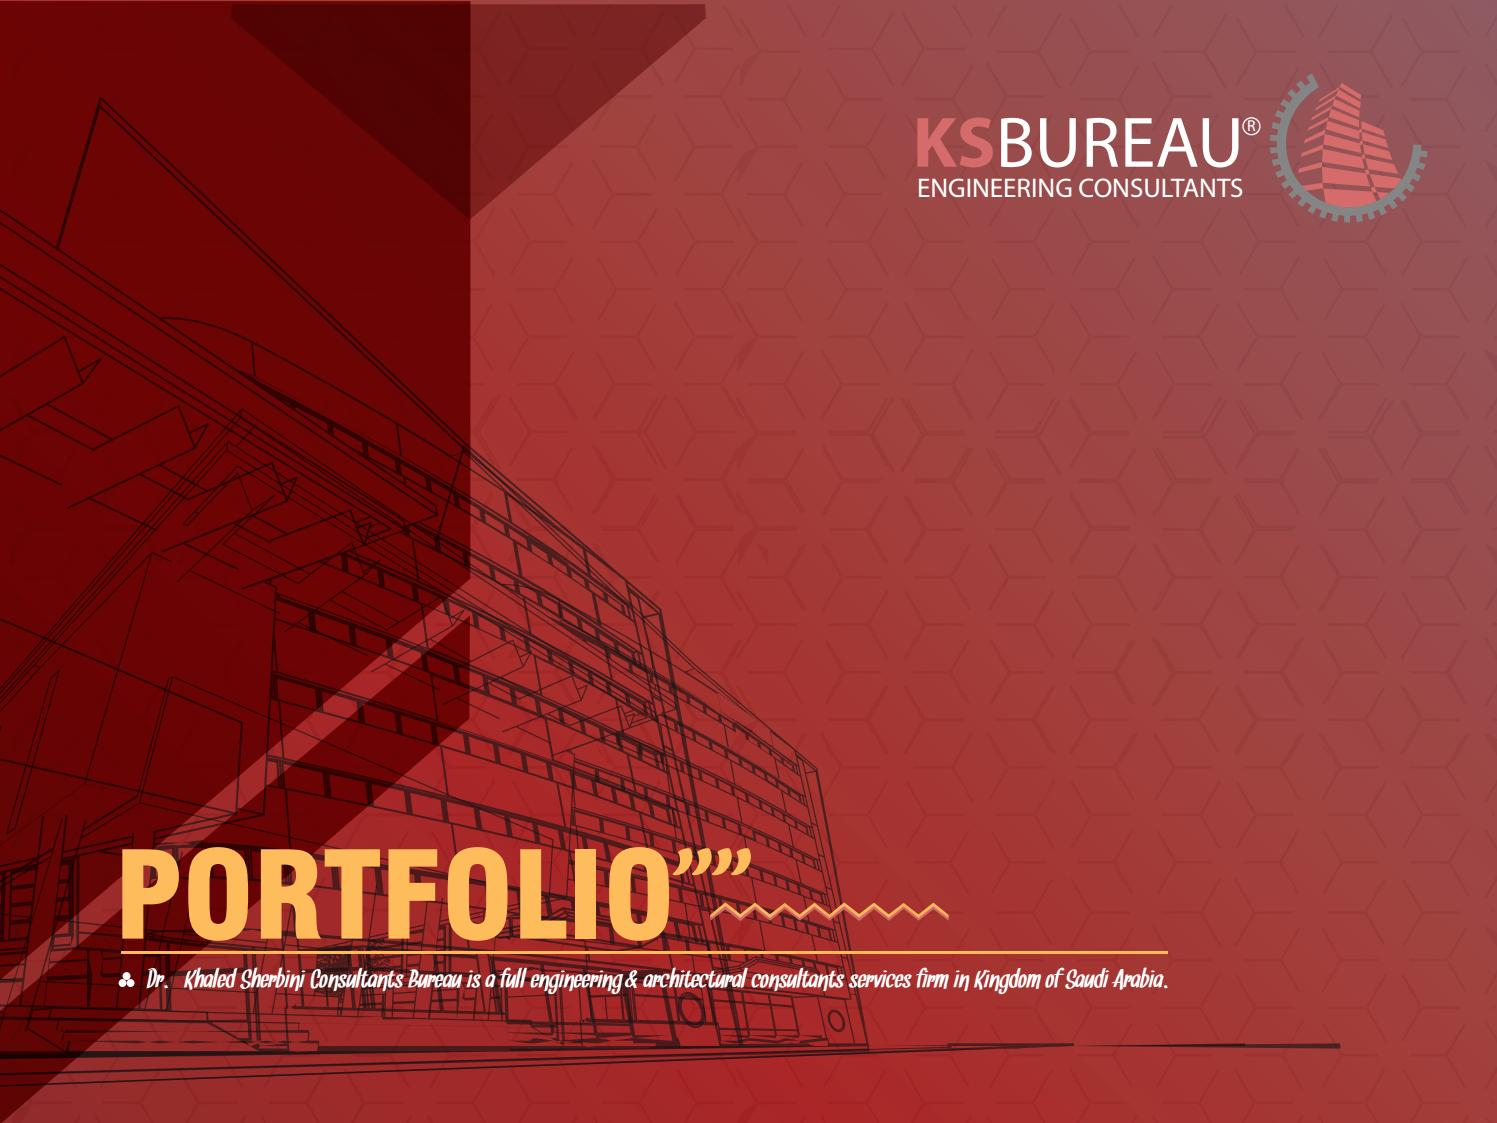 KSBUREAU Portfolio by KSBUREAU - issuu